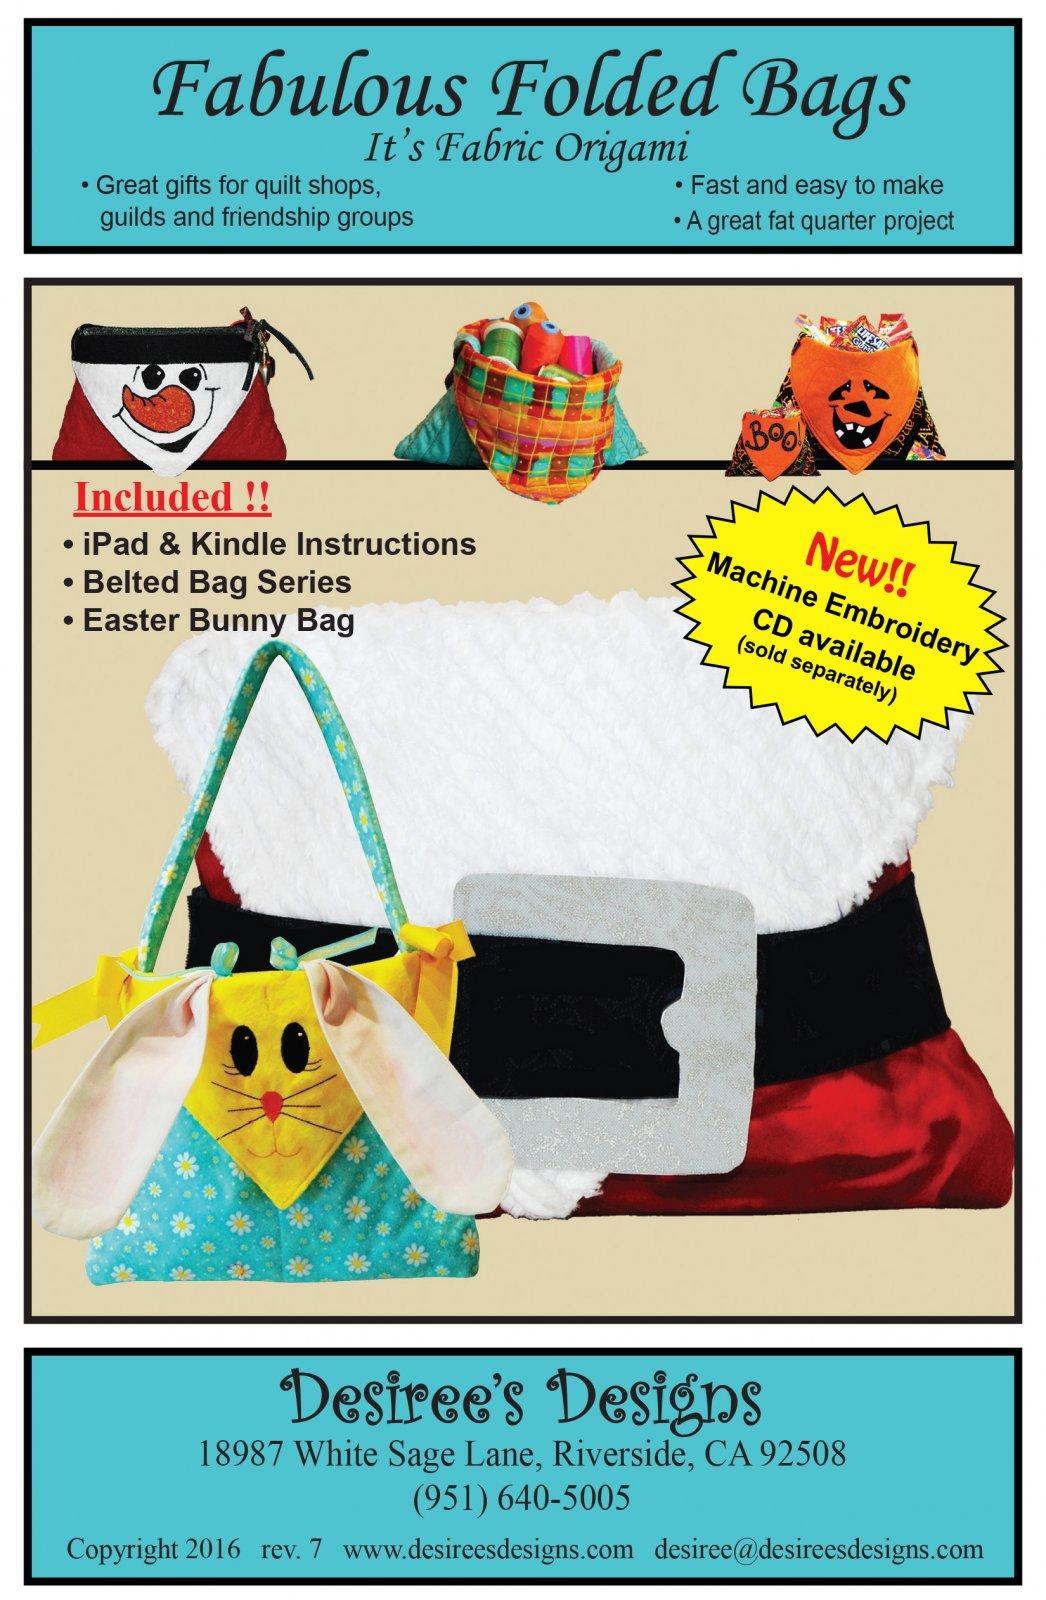 Fabulous Folded Bags